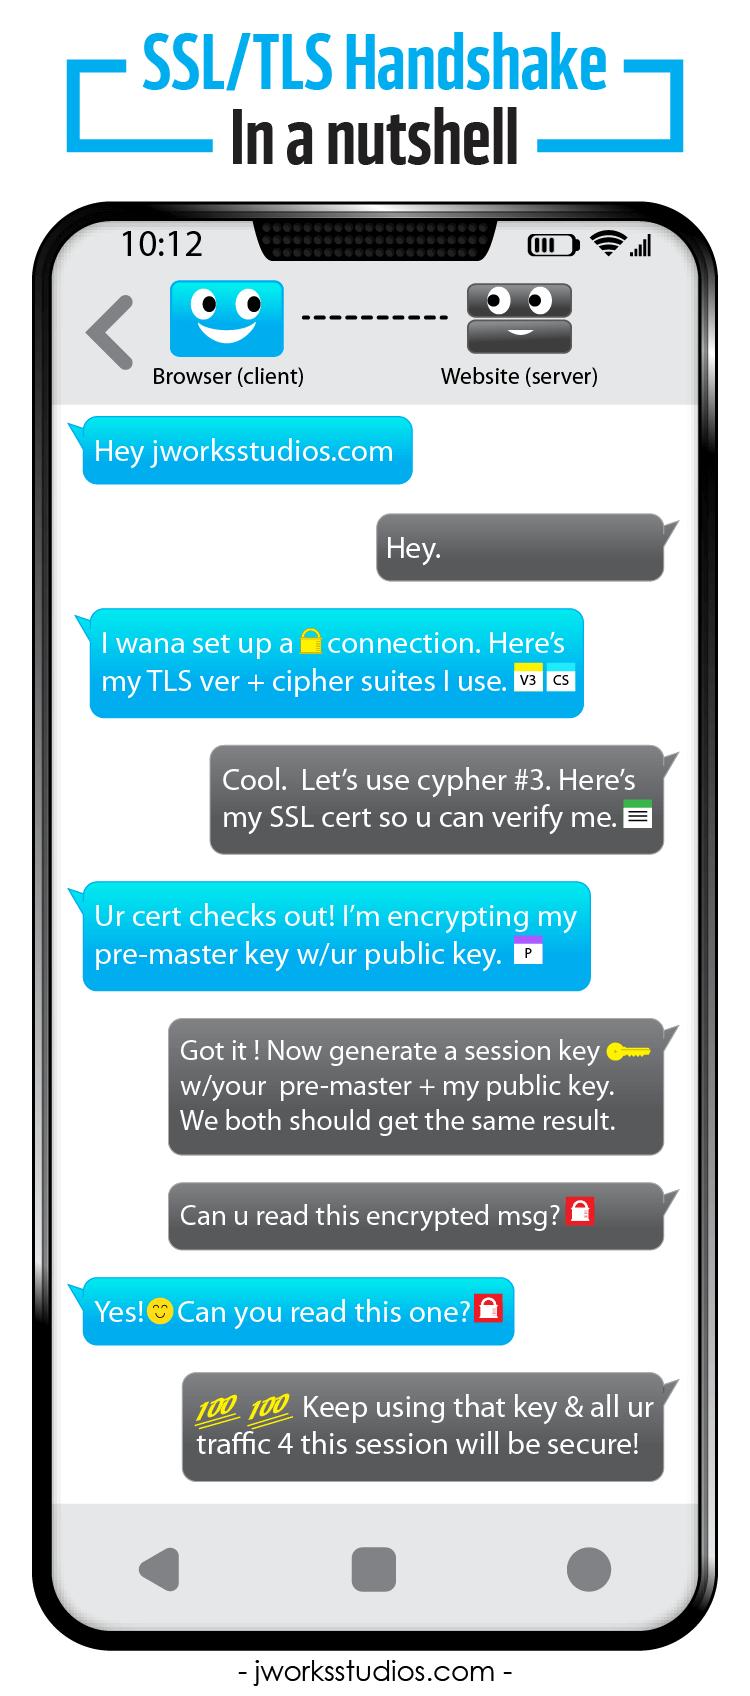 SSL/TLS handshake infographic